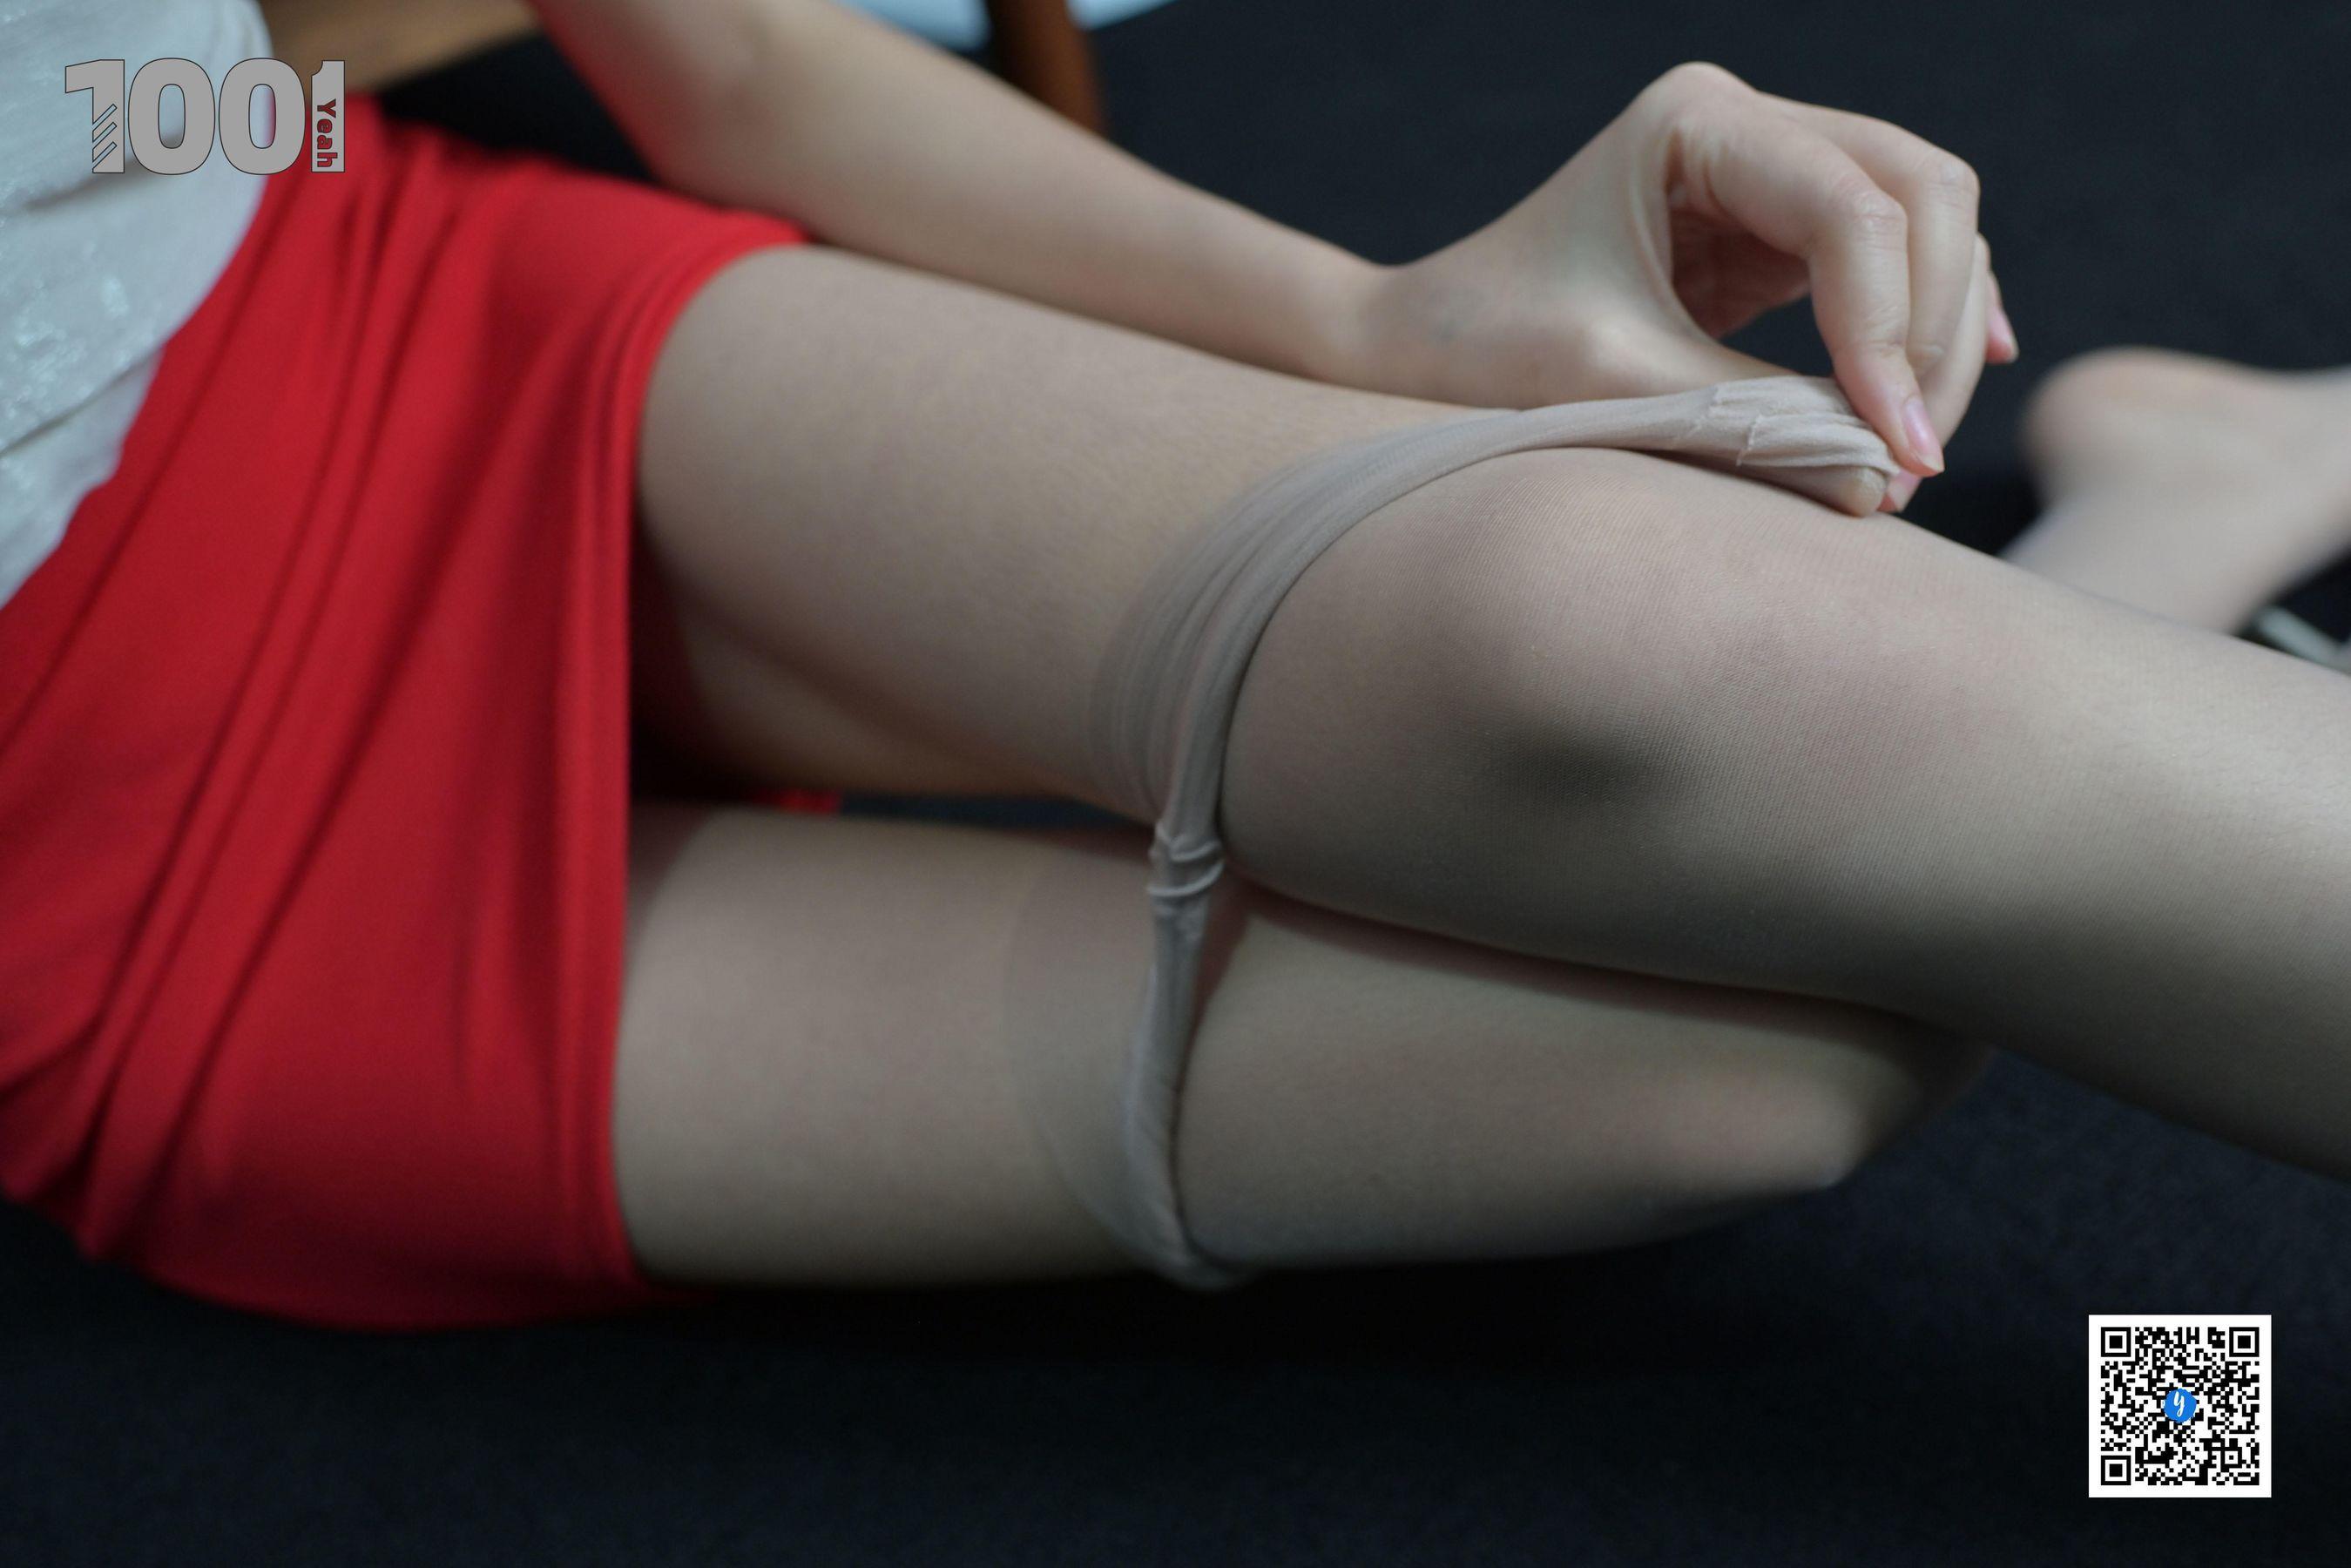 VOL.140 [异思趣向]丝袜诱惑:匿名超高清写真套图(90P)